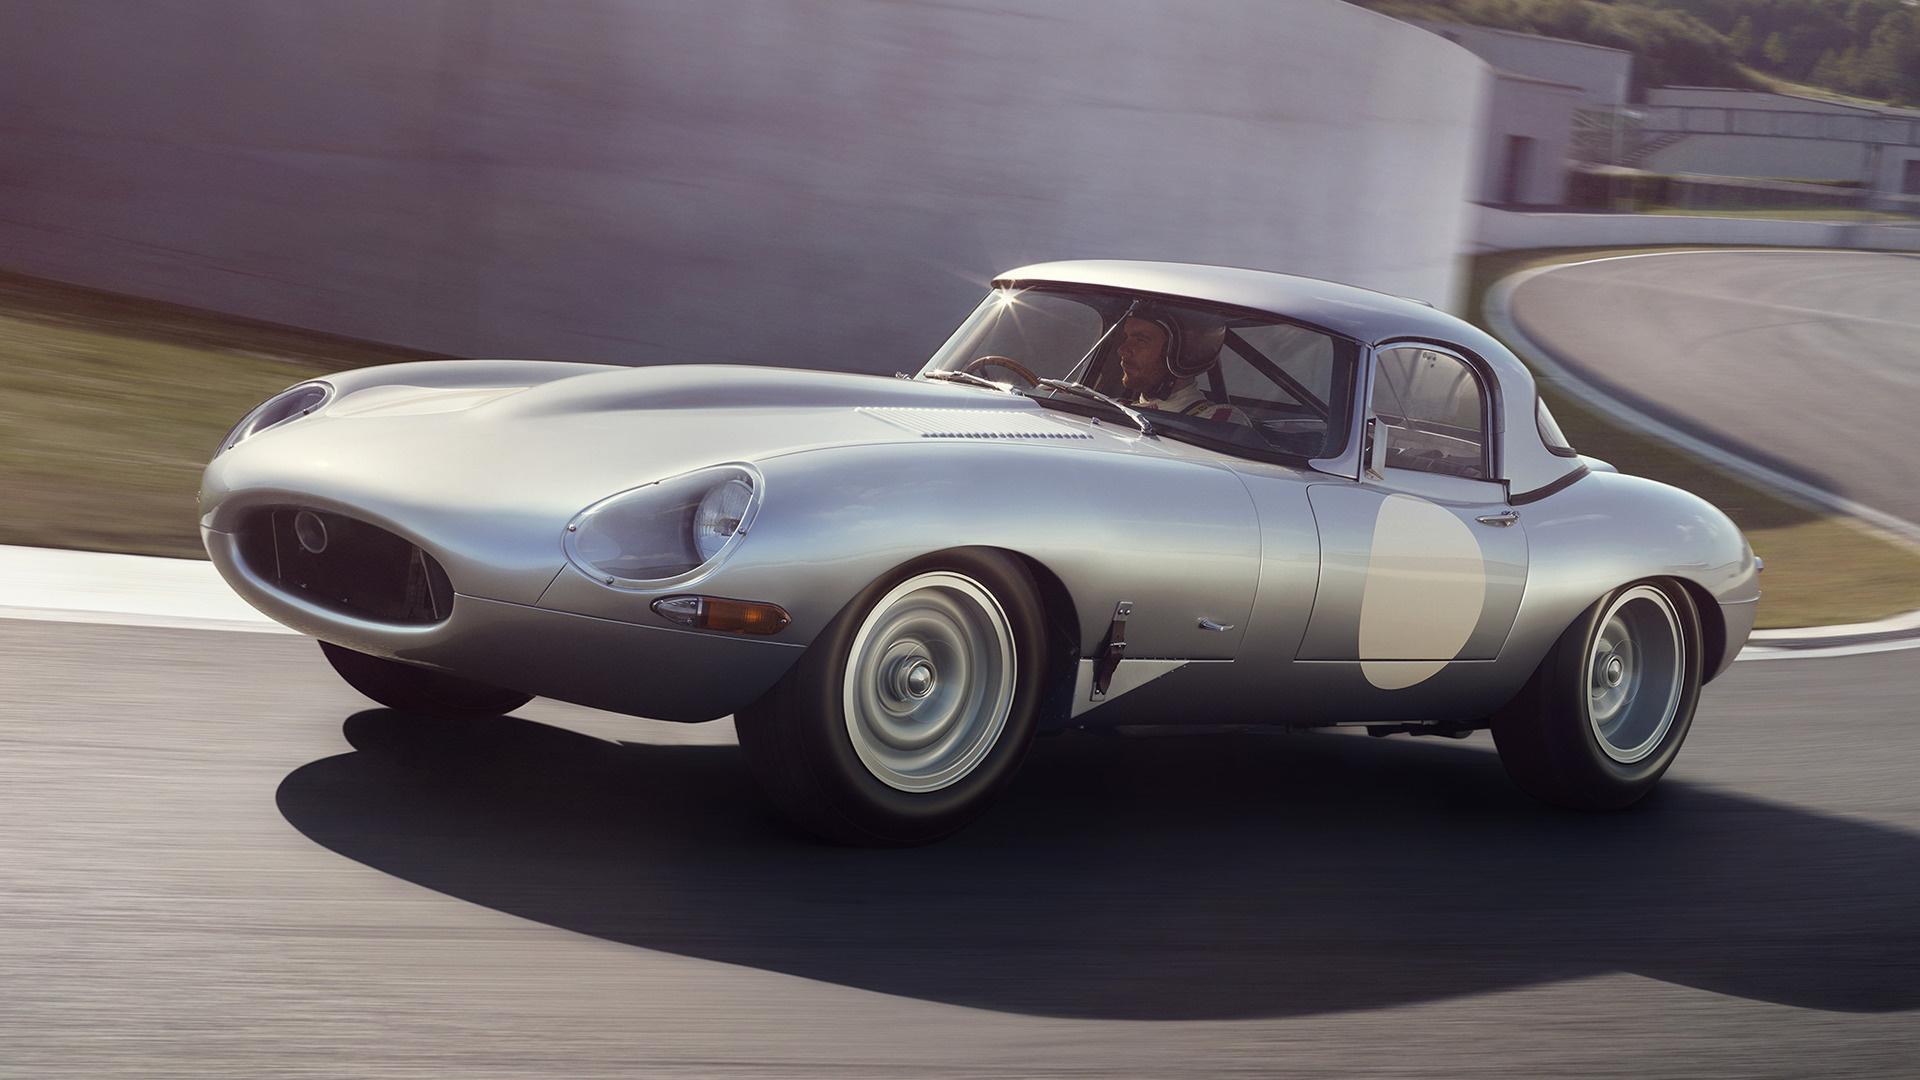 Jaguar Lightweight E Type 2014 Uk Wallpapers And Hd Images Car Pixel